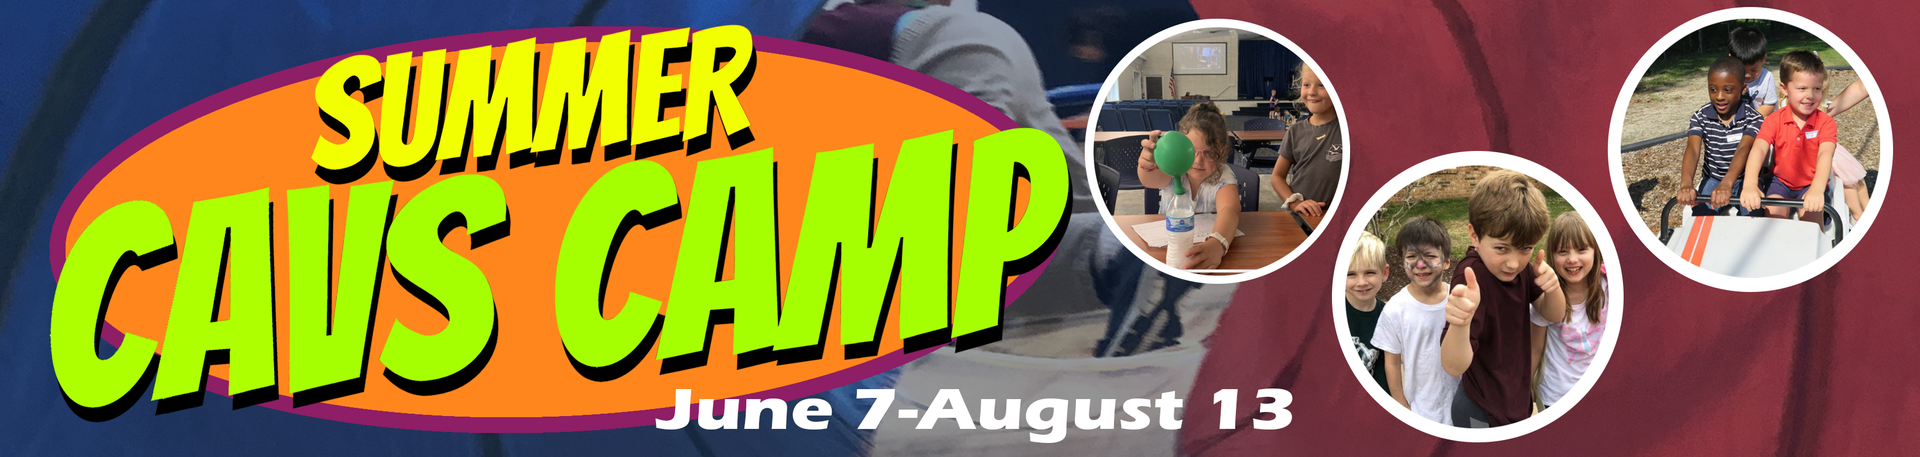 Summer Cavs Camp